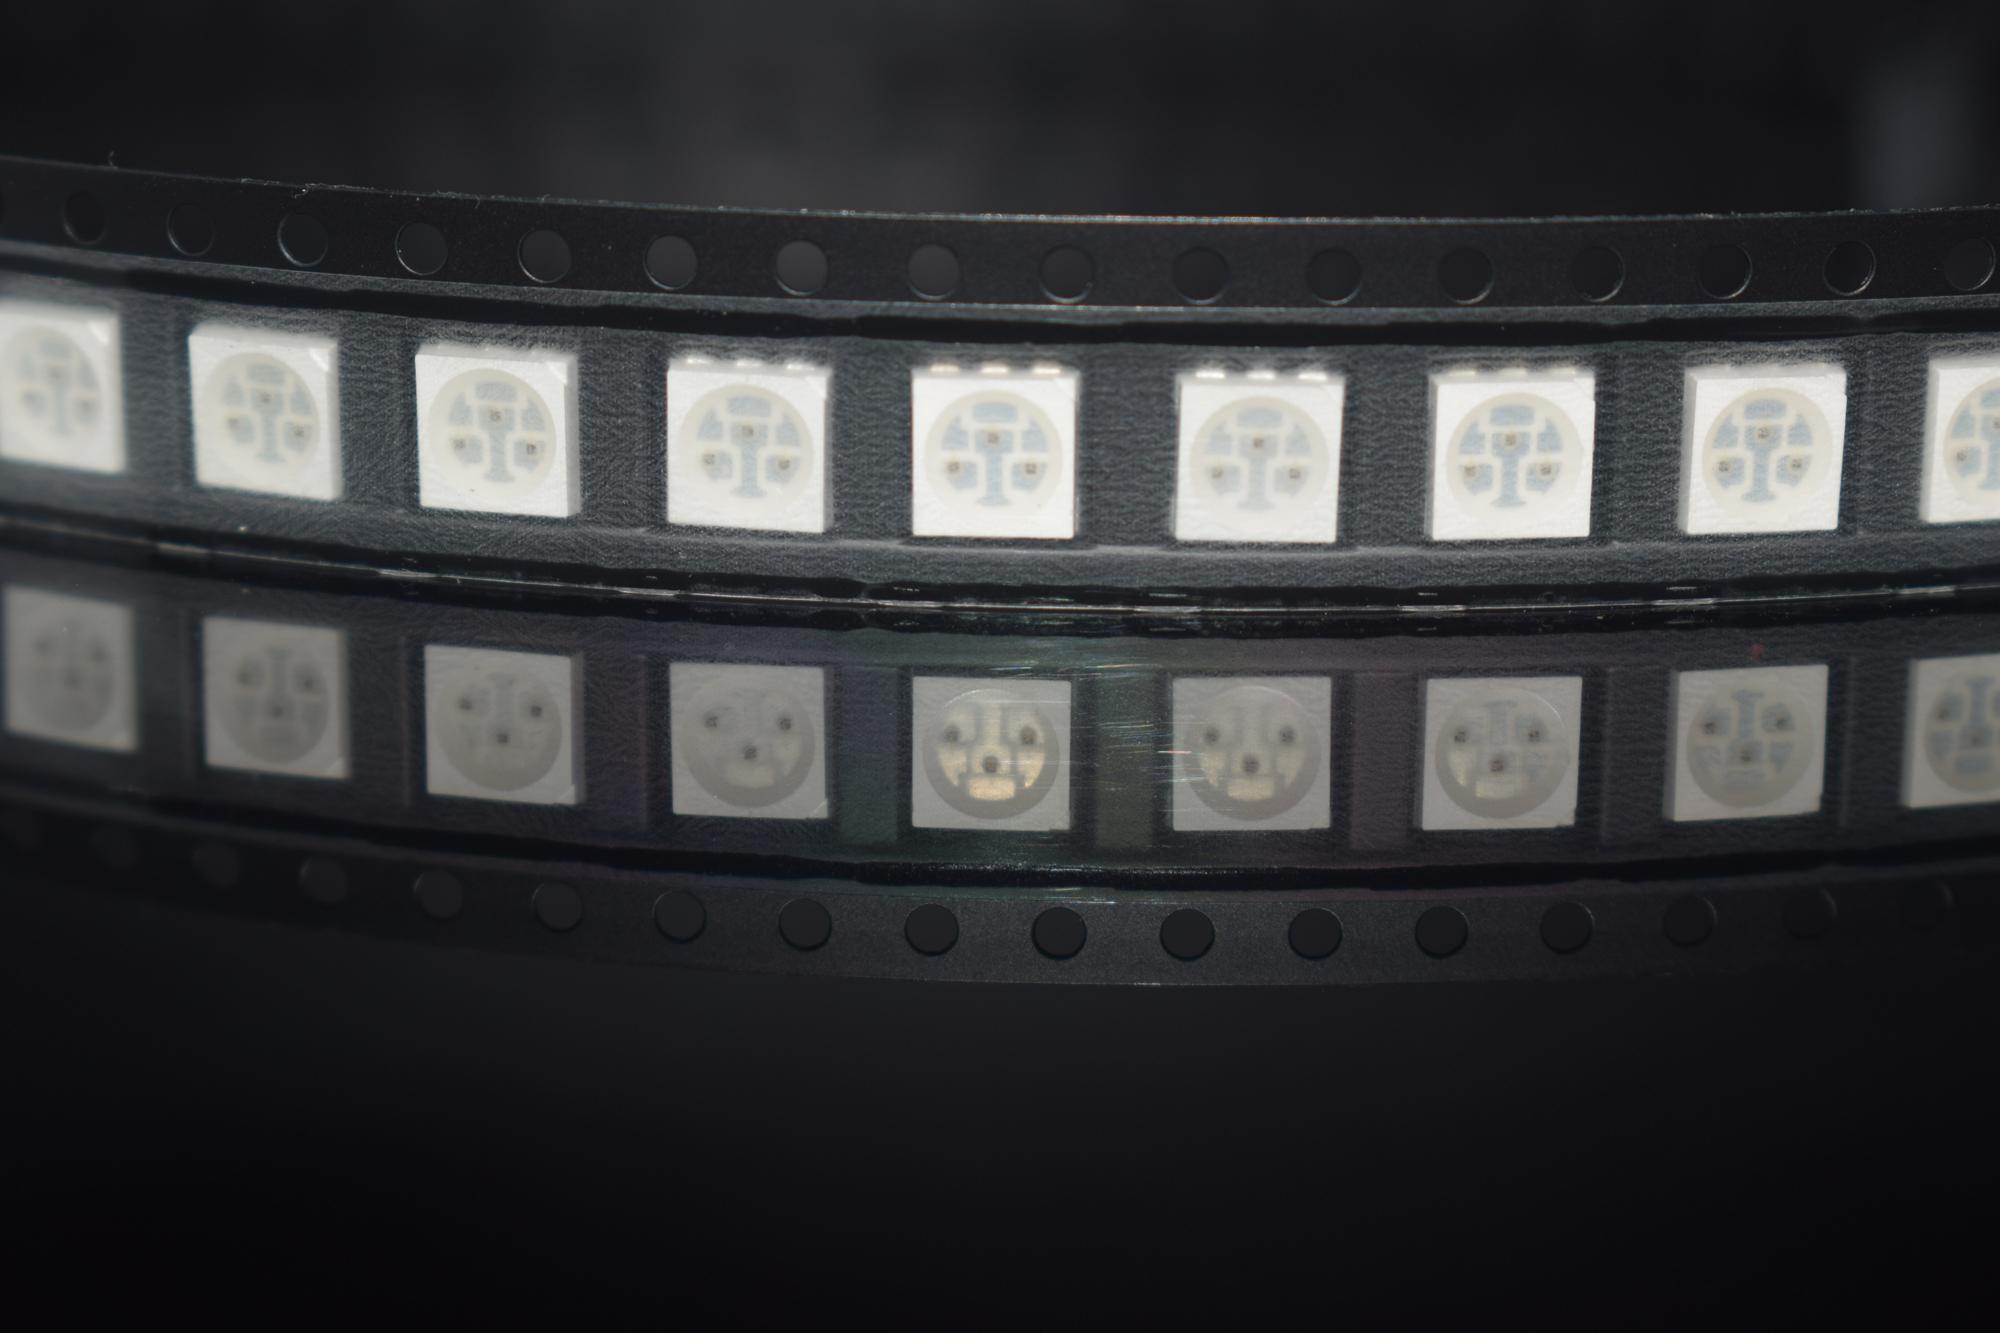 IR LED 5050